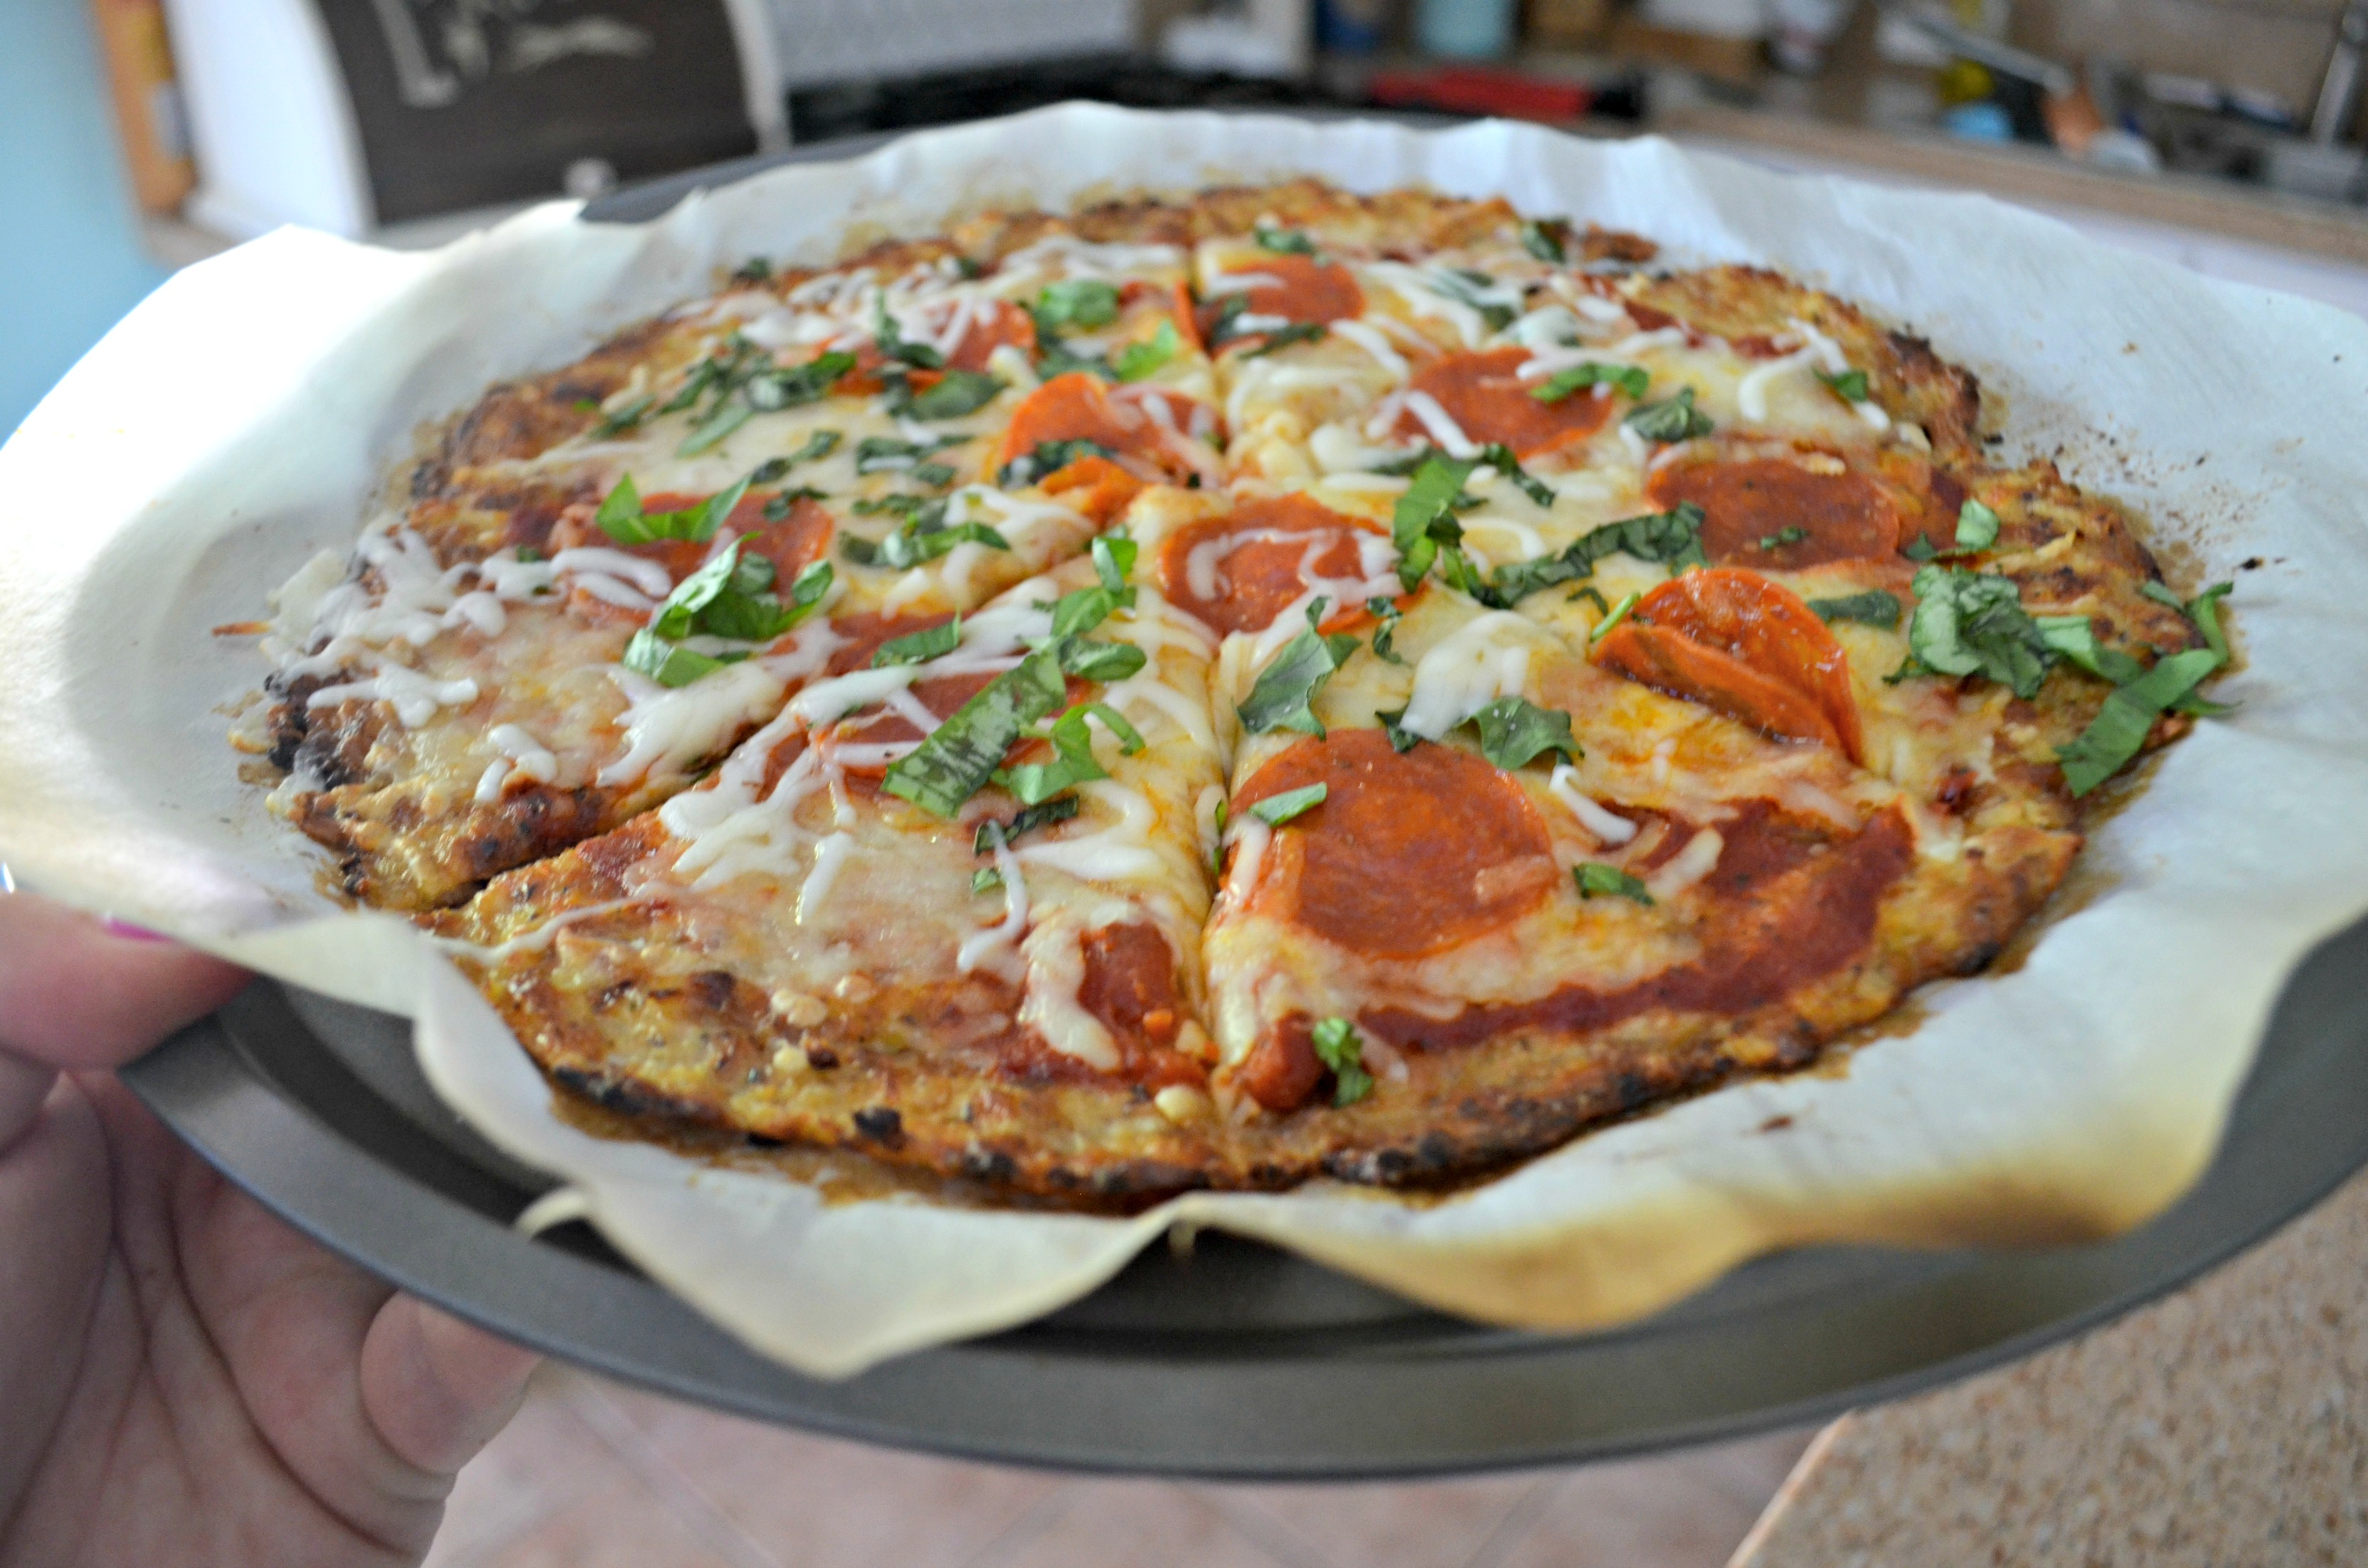 We compare the best keto pizza crust recipe | Here: Cauliflower